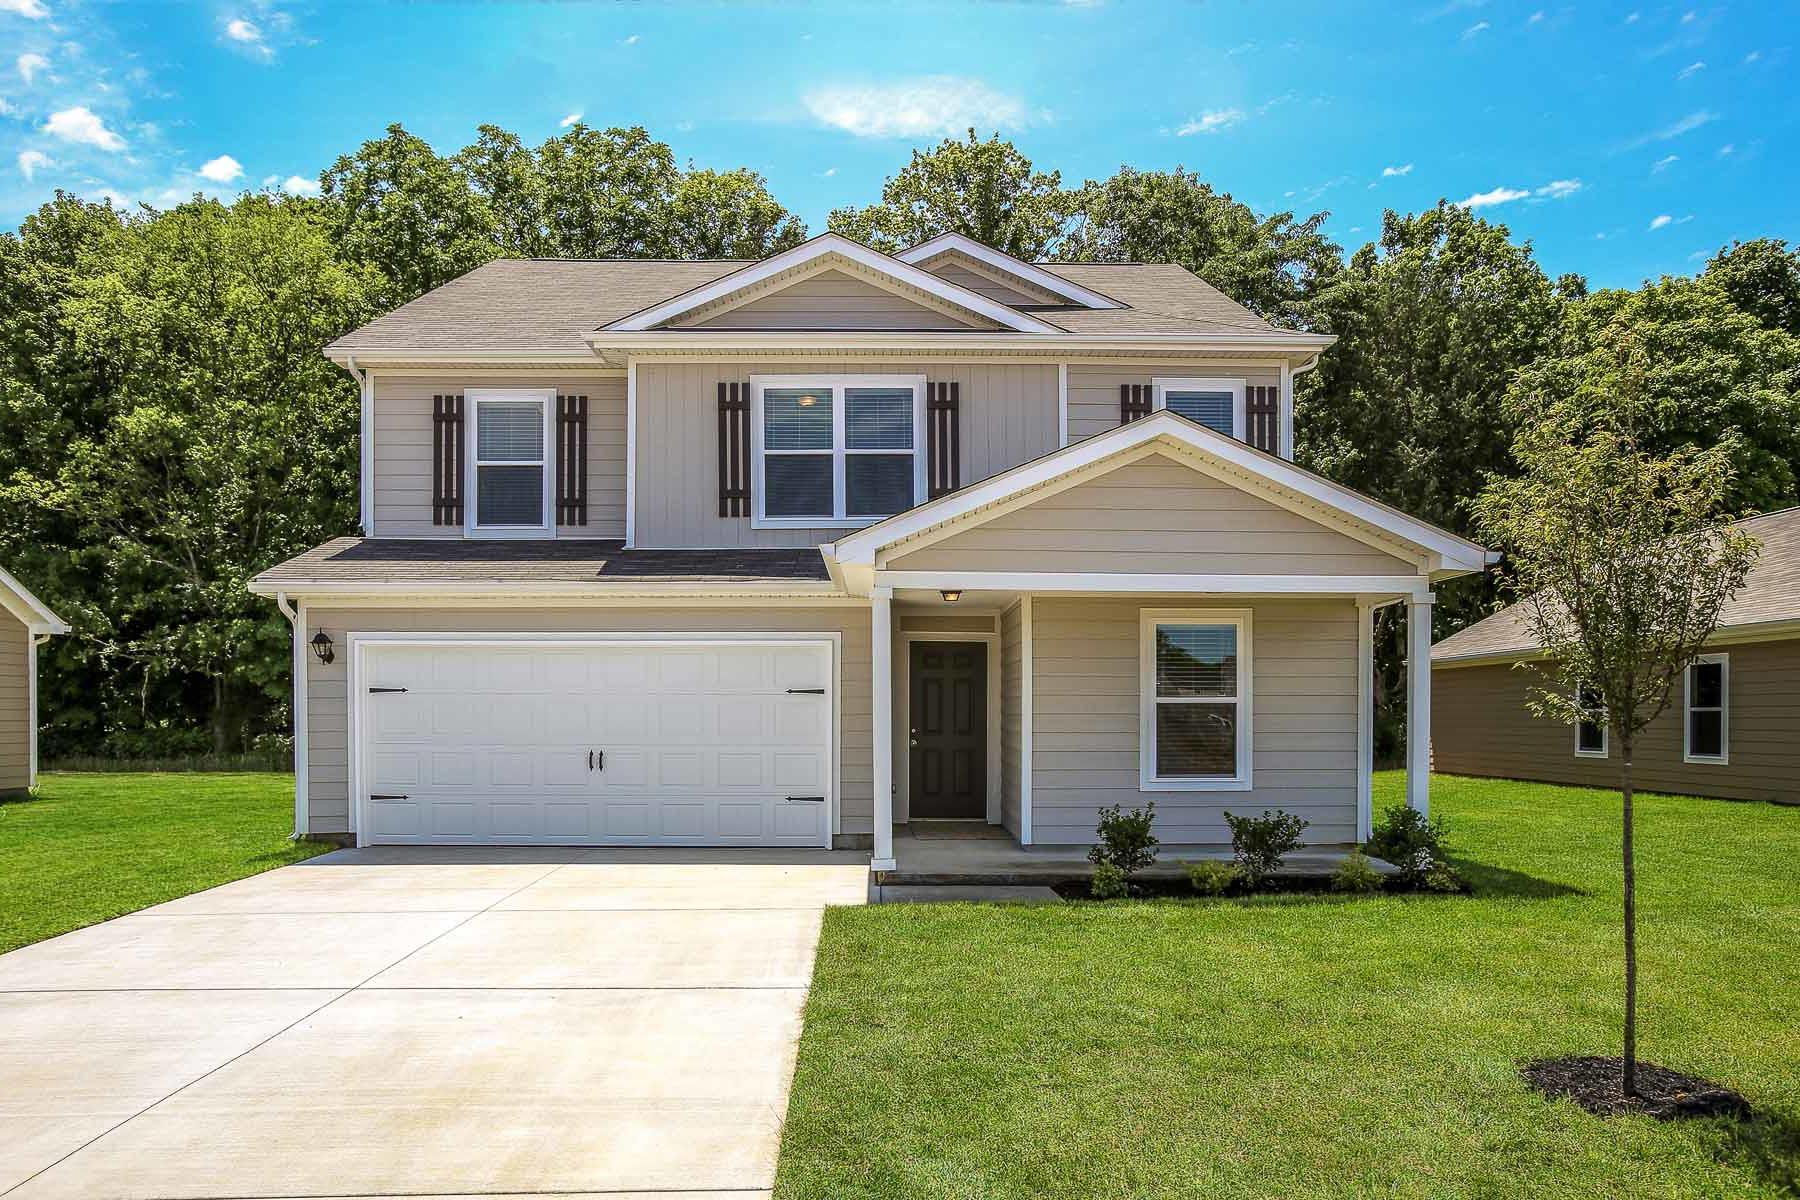 3702 Burdette Way, Murfreesboro, TN 37128 - Murfreesboro, TN real estate listing